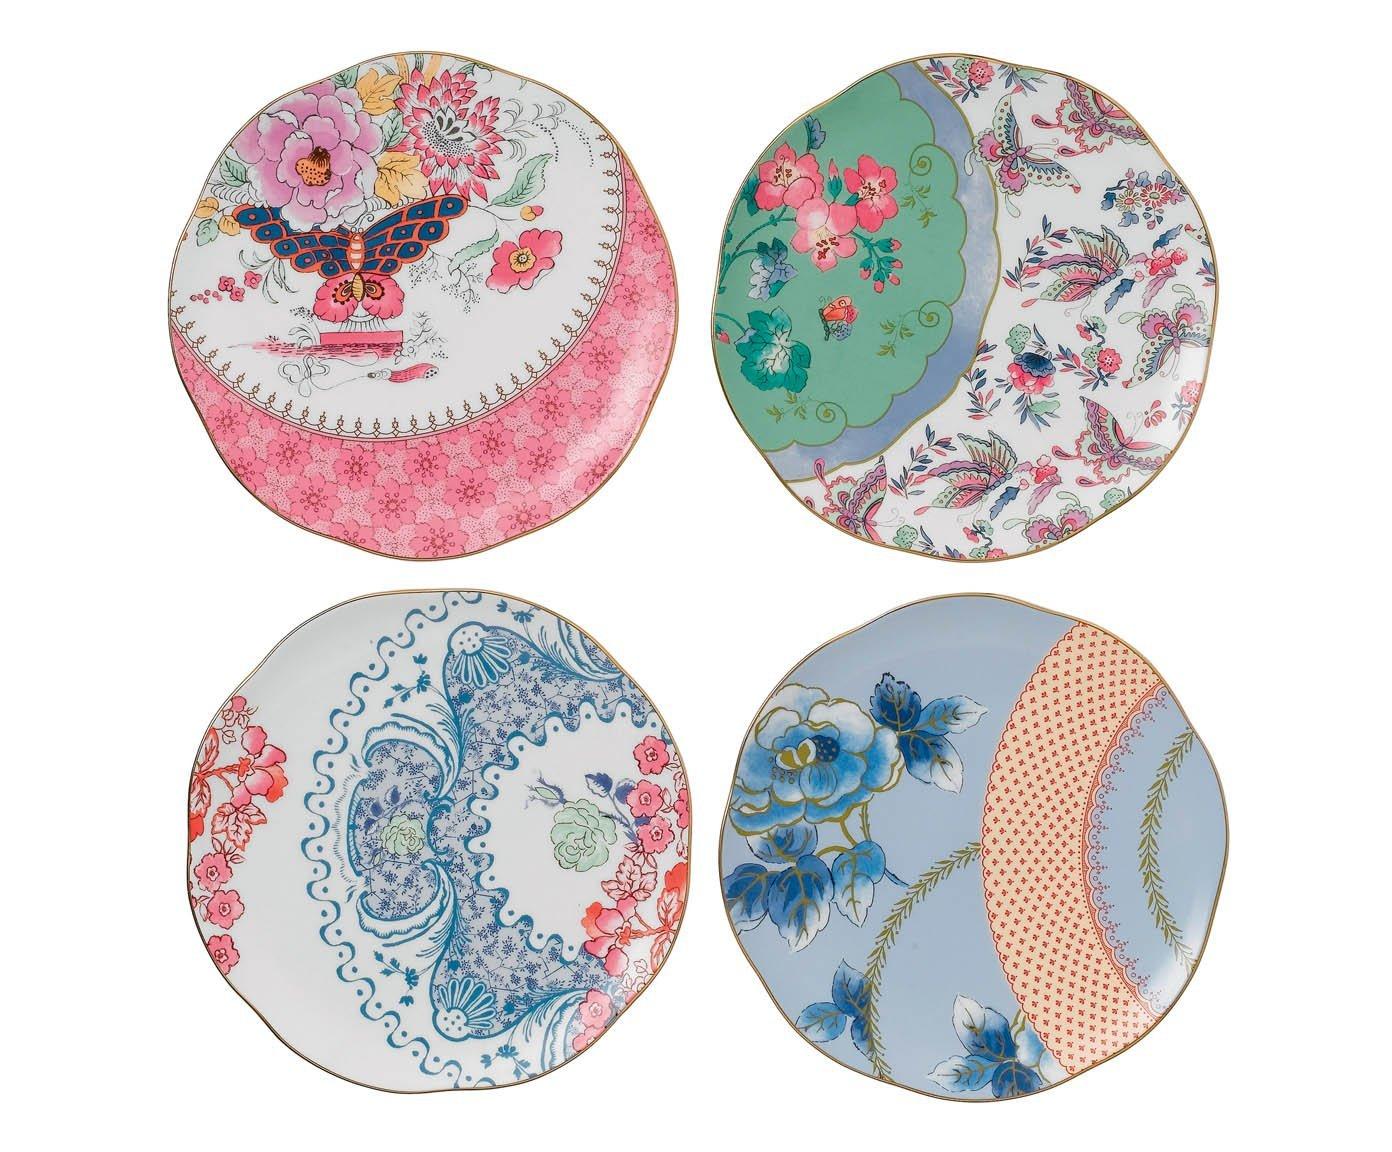 Stijl je keuken gekleurde borden Foodblog Foodinista